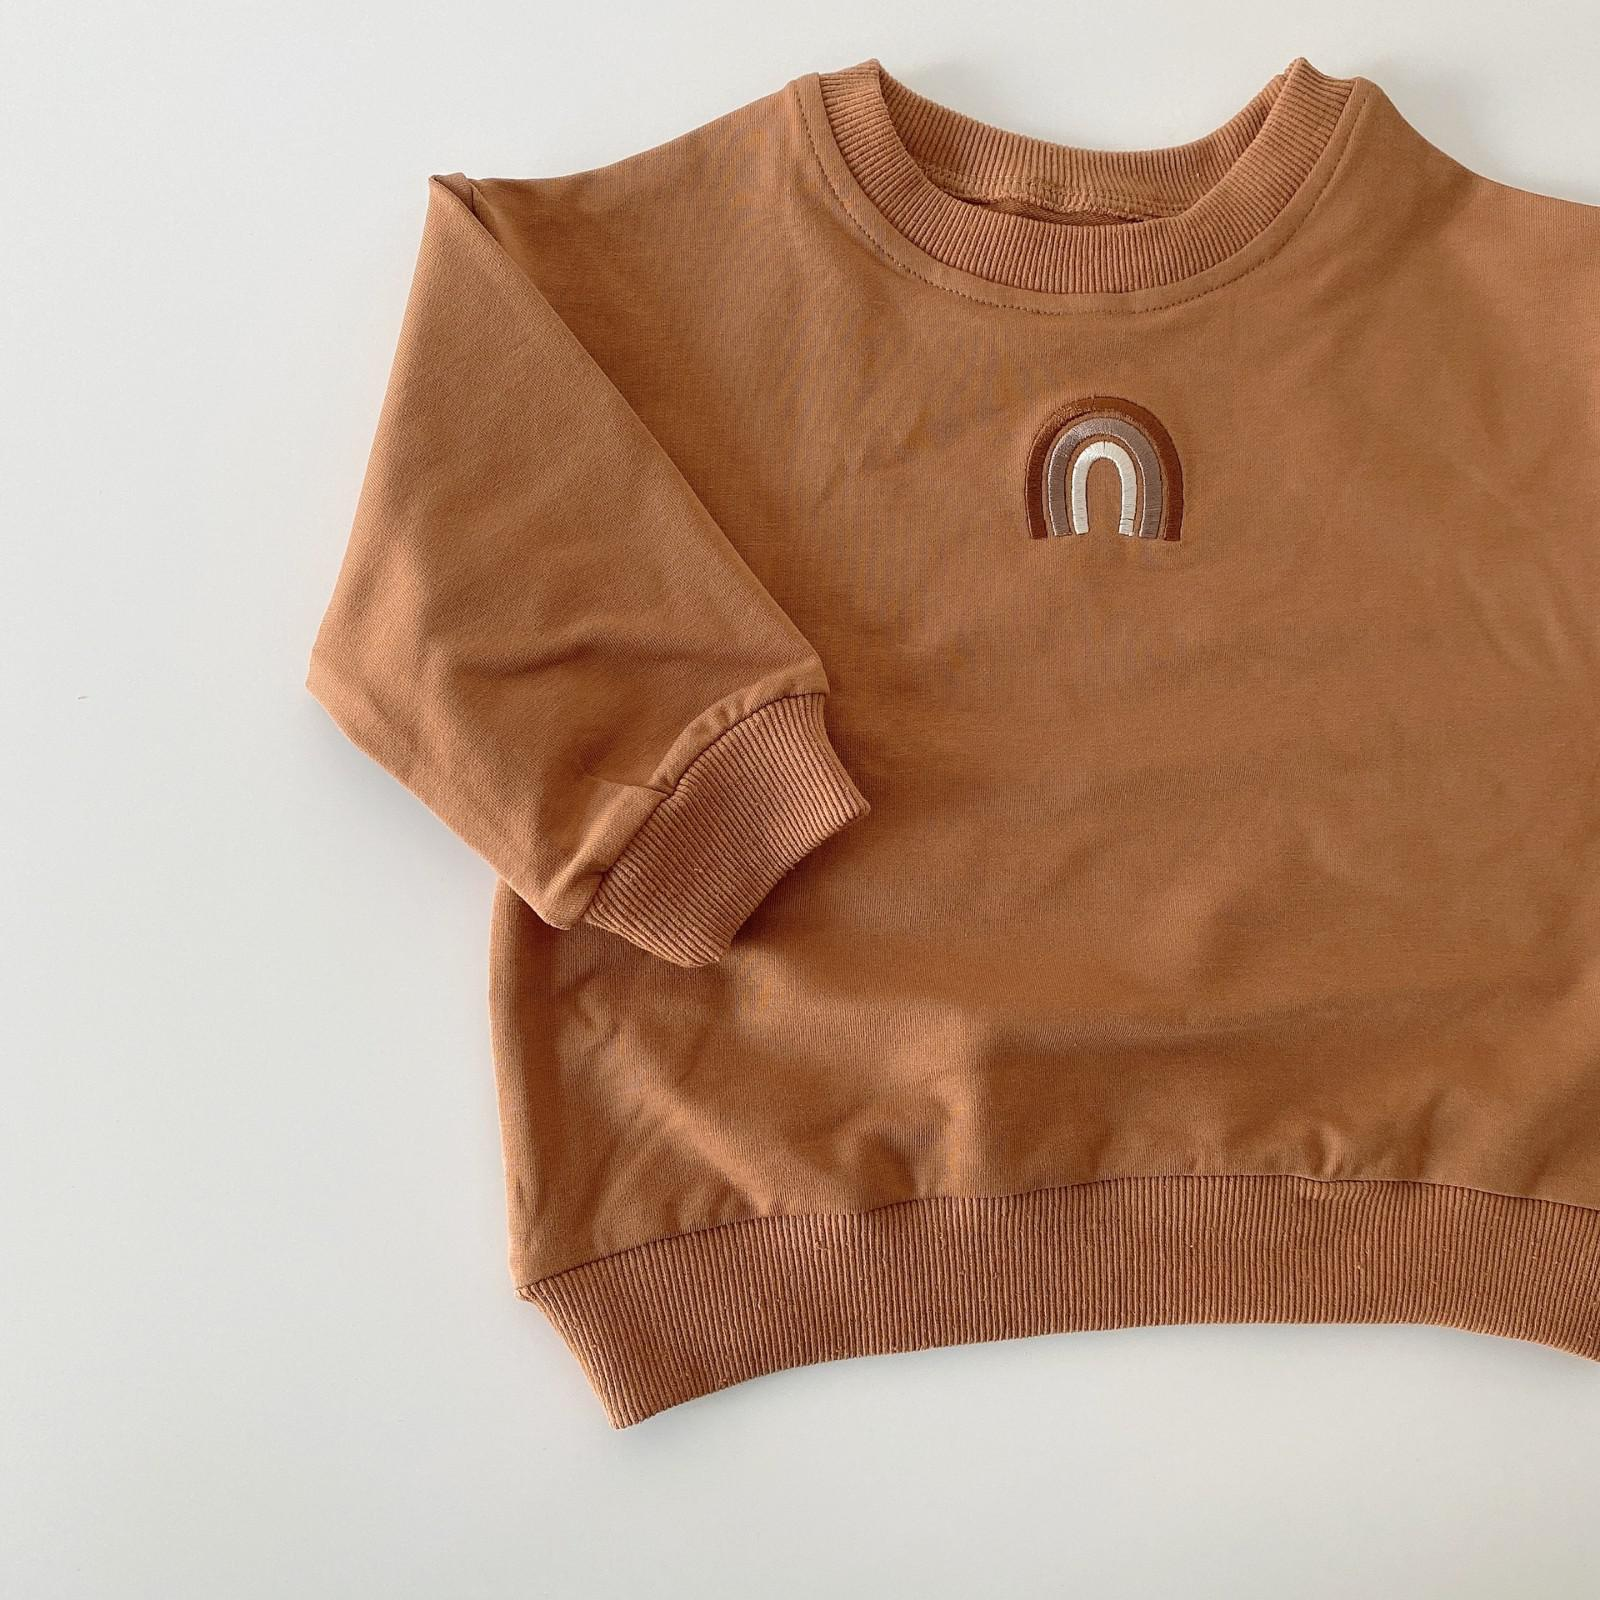 Autumn Baby Girls Embroidery Rainbow Sweatshirts Long Sleeve Tops Kids Toddler Boys Pullover Sweatshirt Rainbow T-shirt Clothes 7